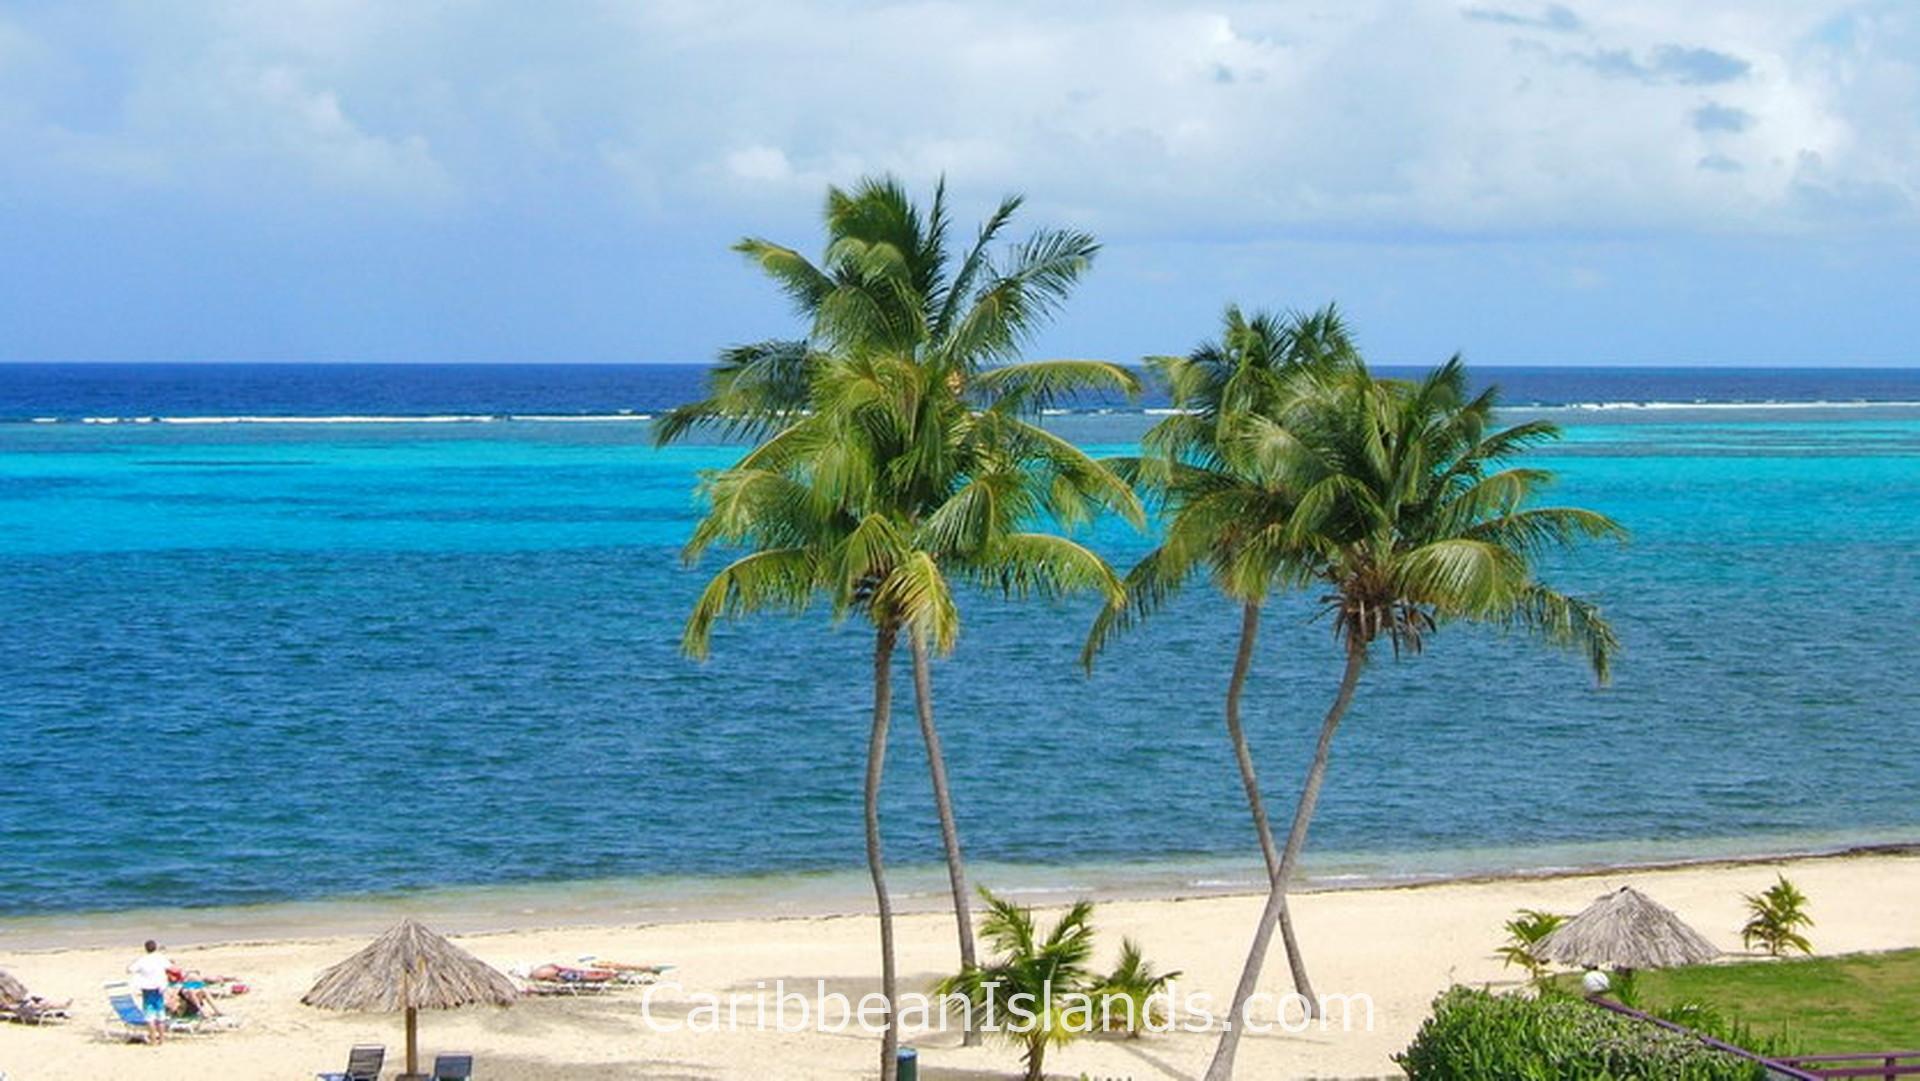 Saint Croix, US Virgin Islands